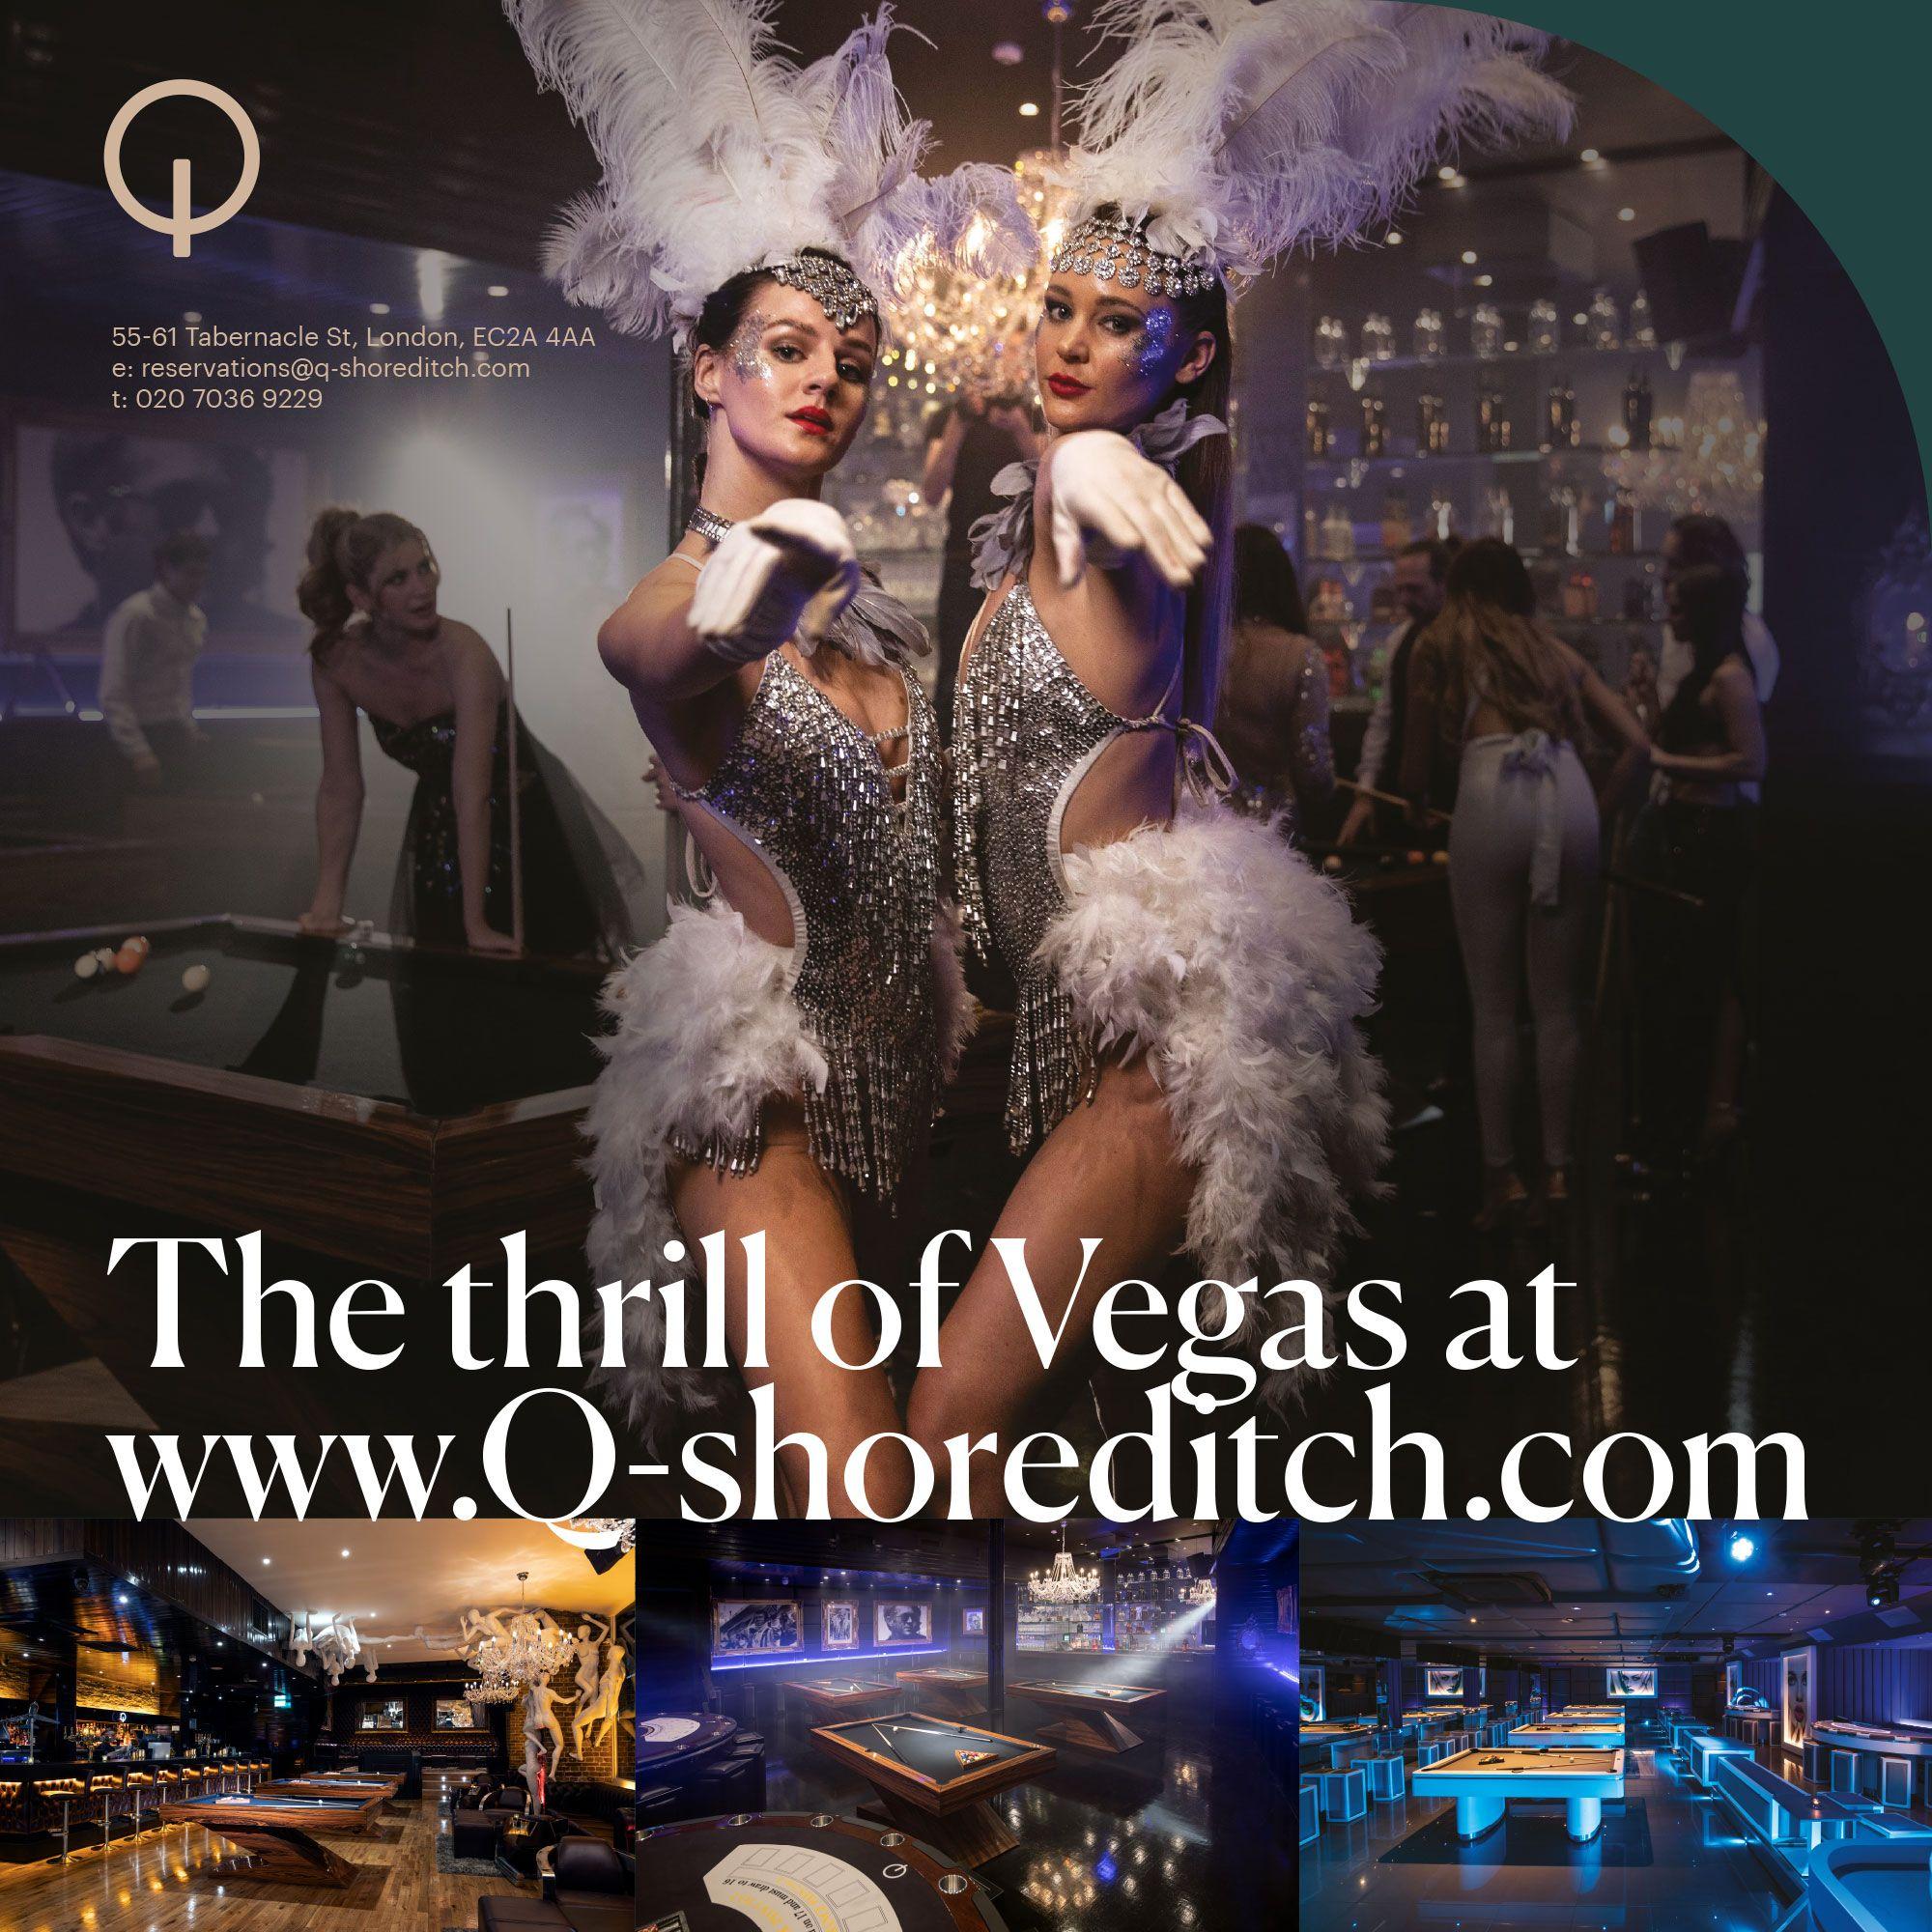 Exhibitor Spotlight - Q-Shoreditch